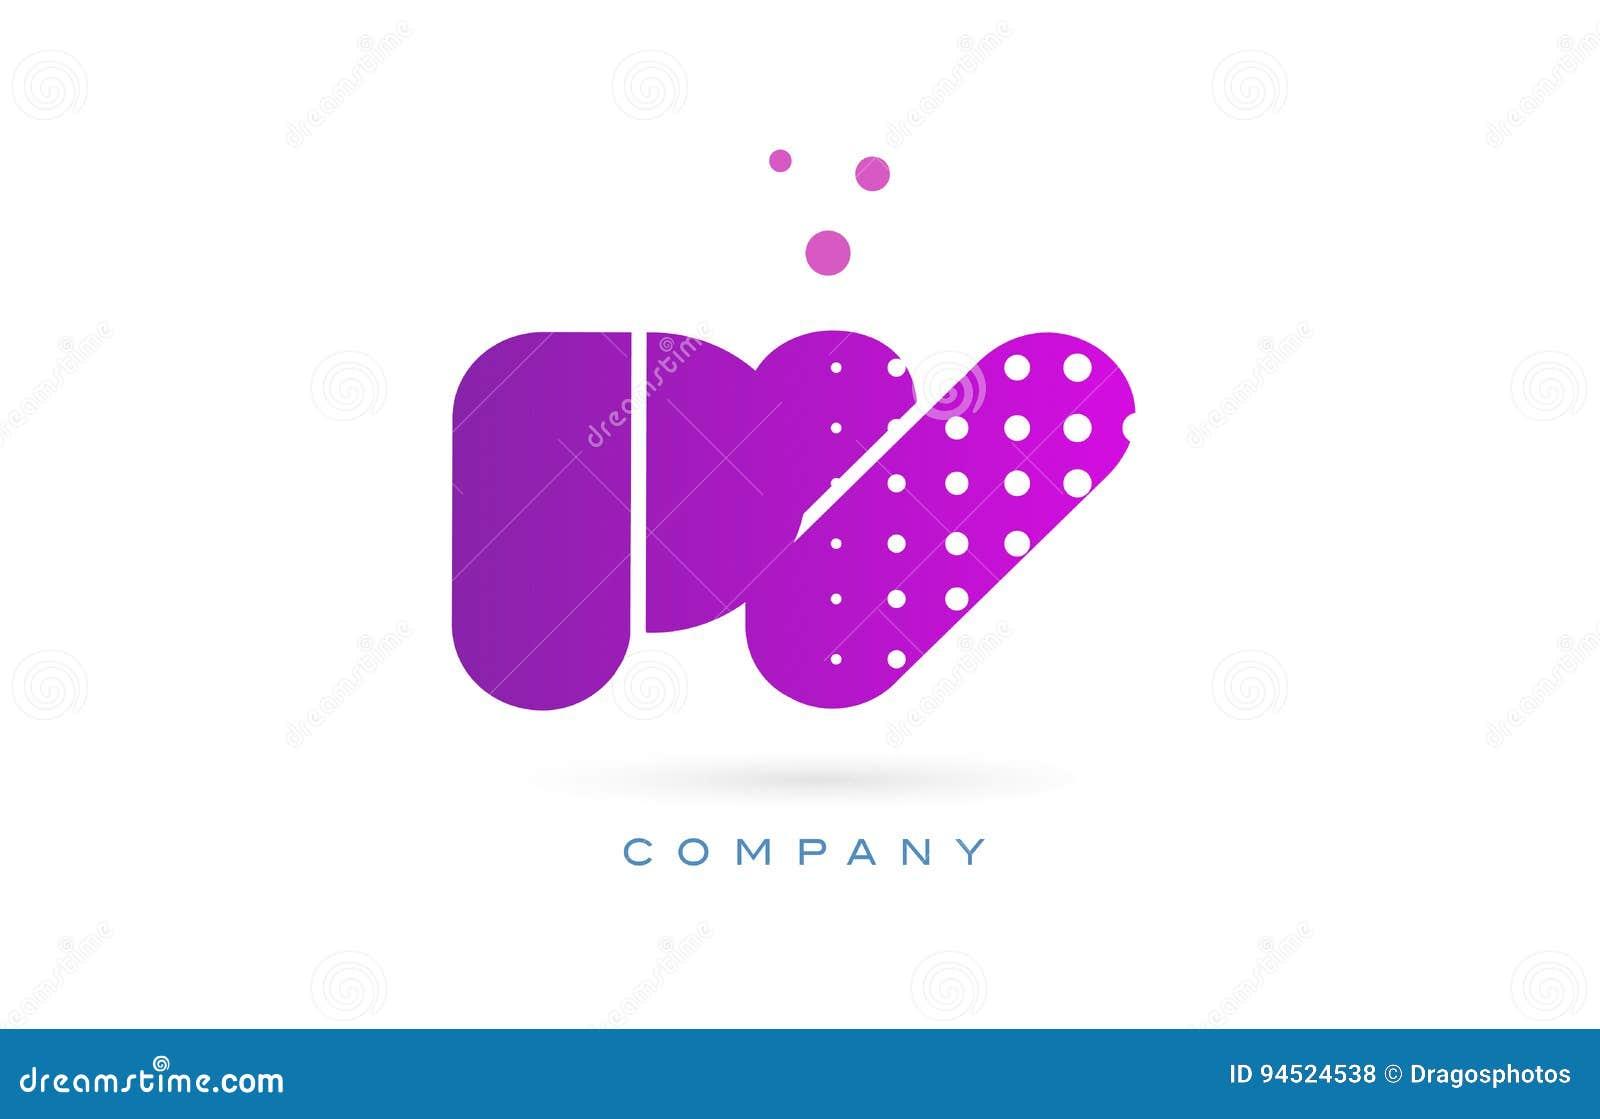 Pv P V Pink Dots Letter Logo Alphabet Icon